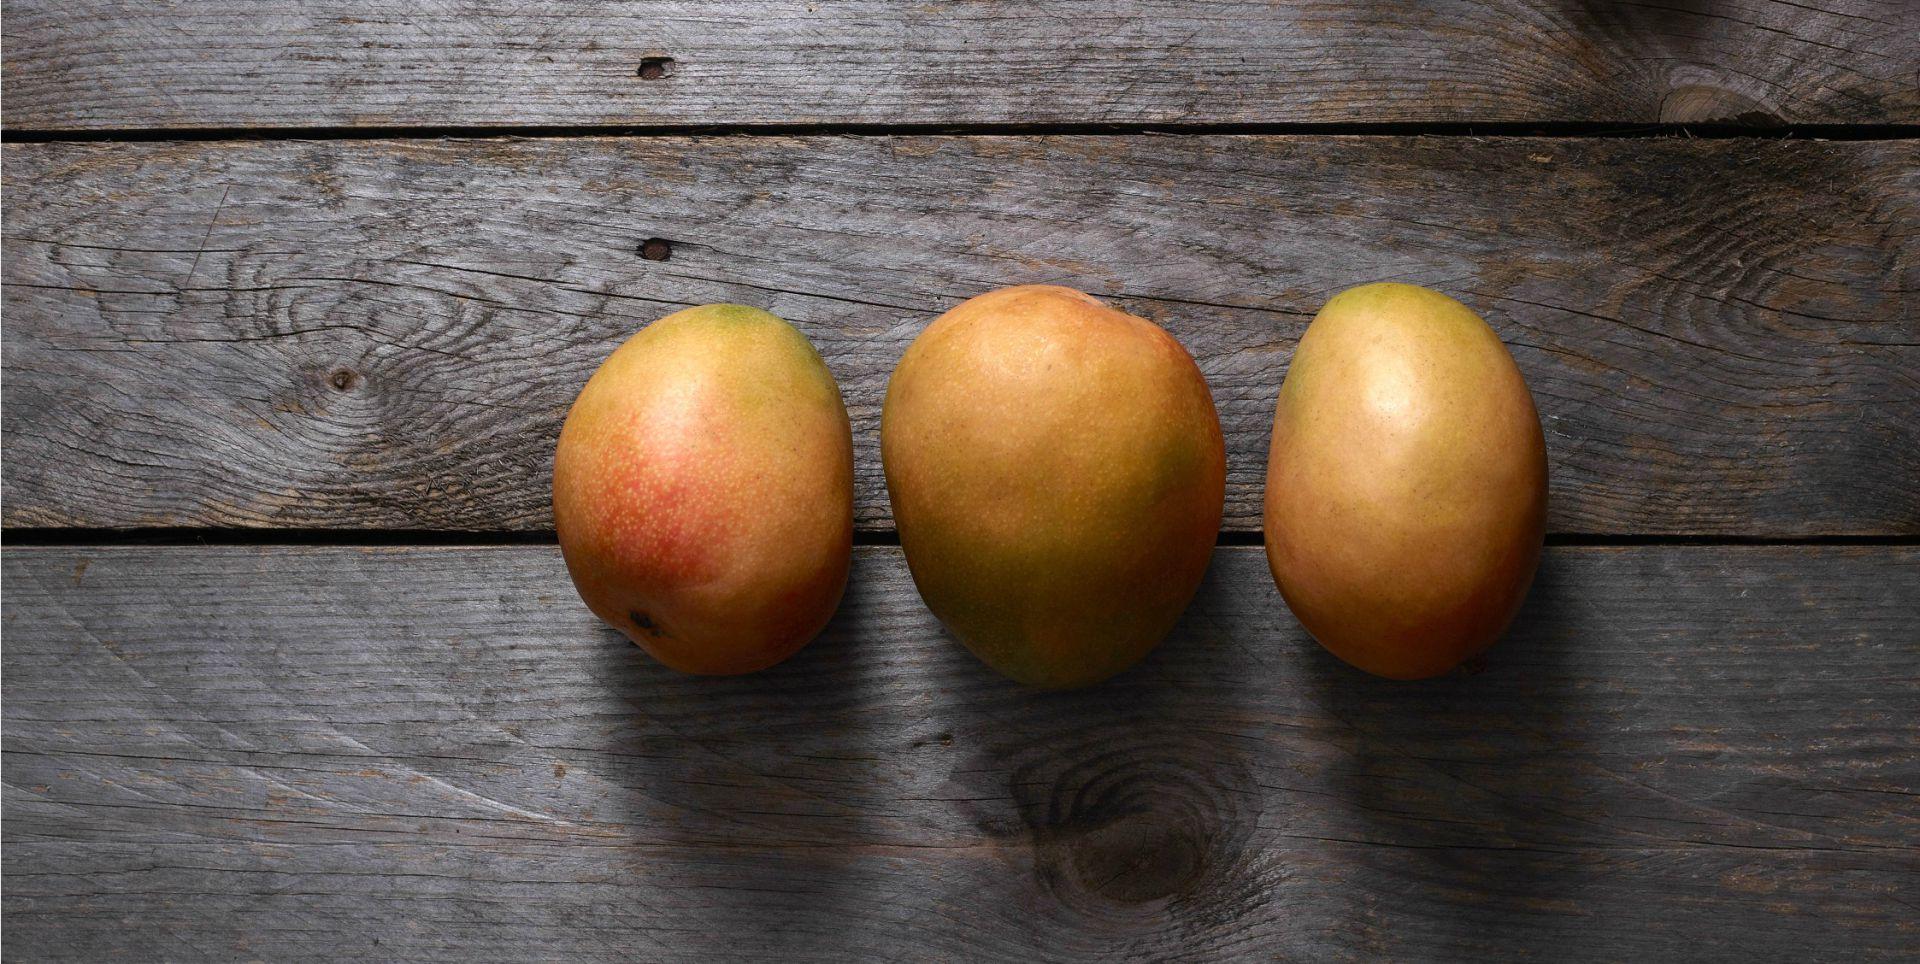 Three Haden Mangos